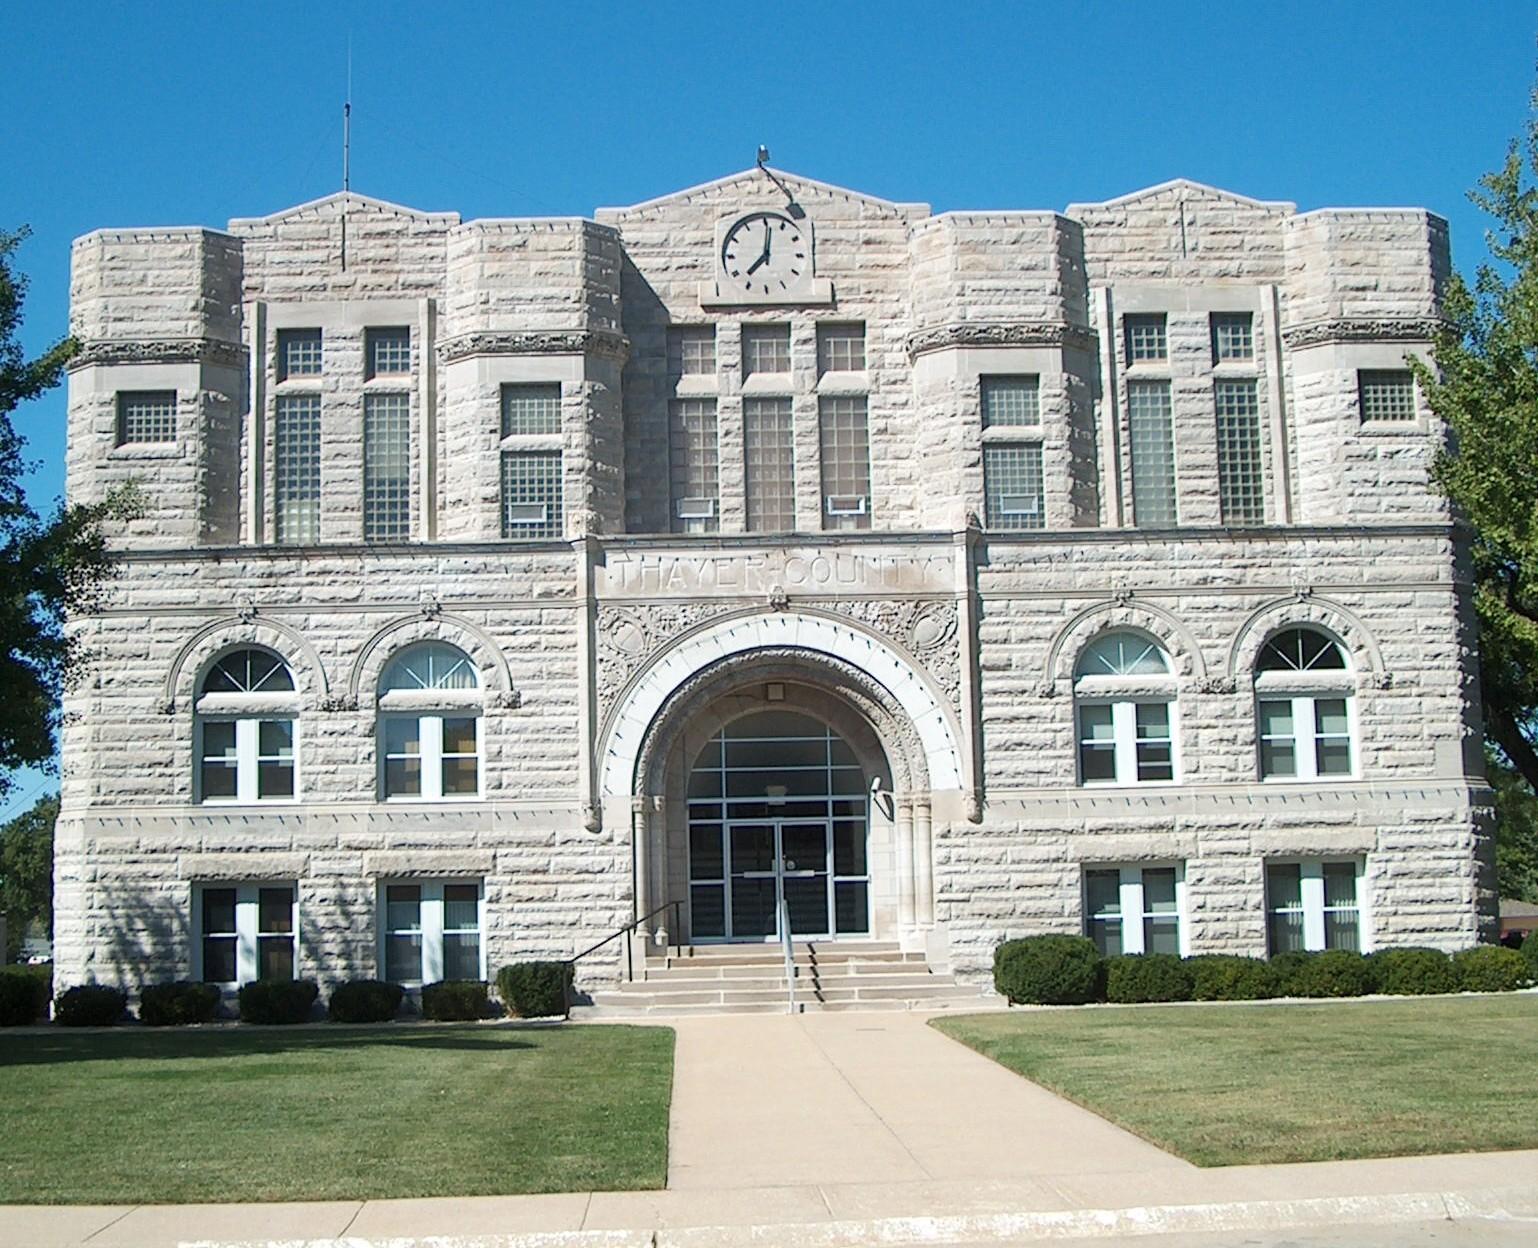 Thayer County Courthouse, Hebron, Nebraska